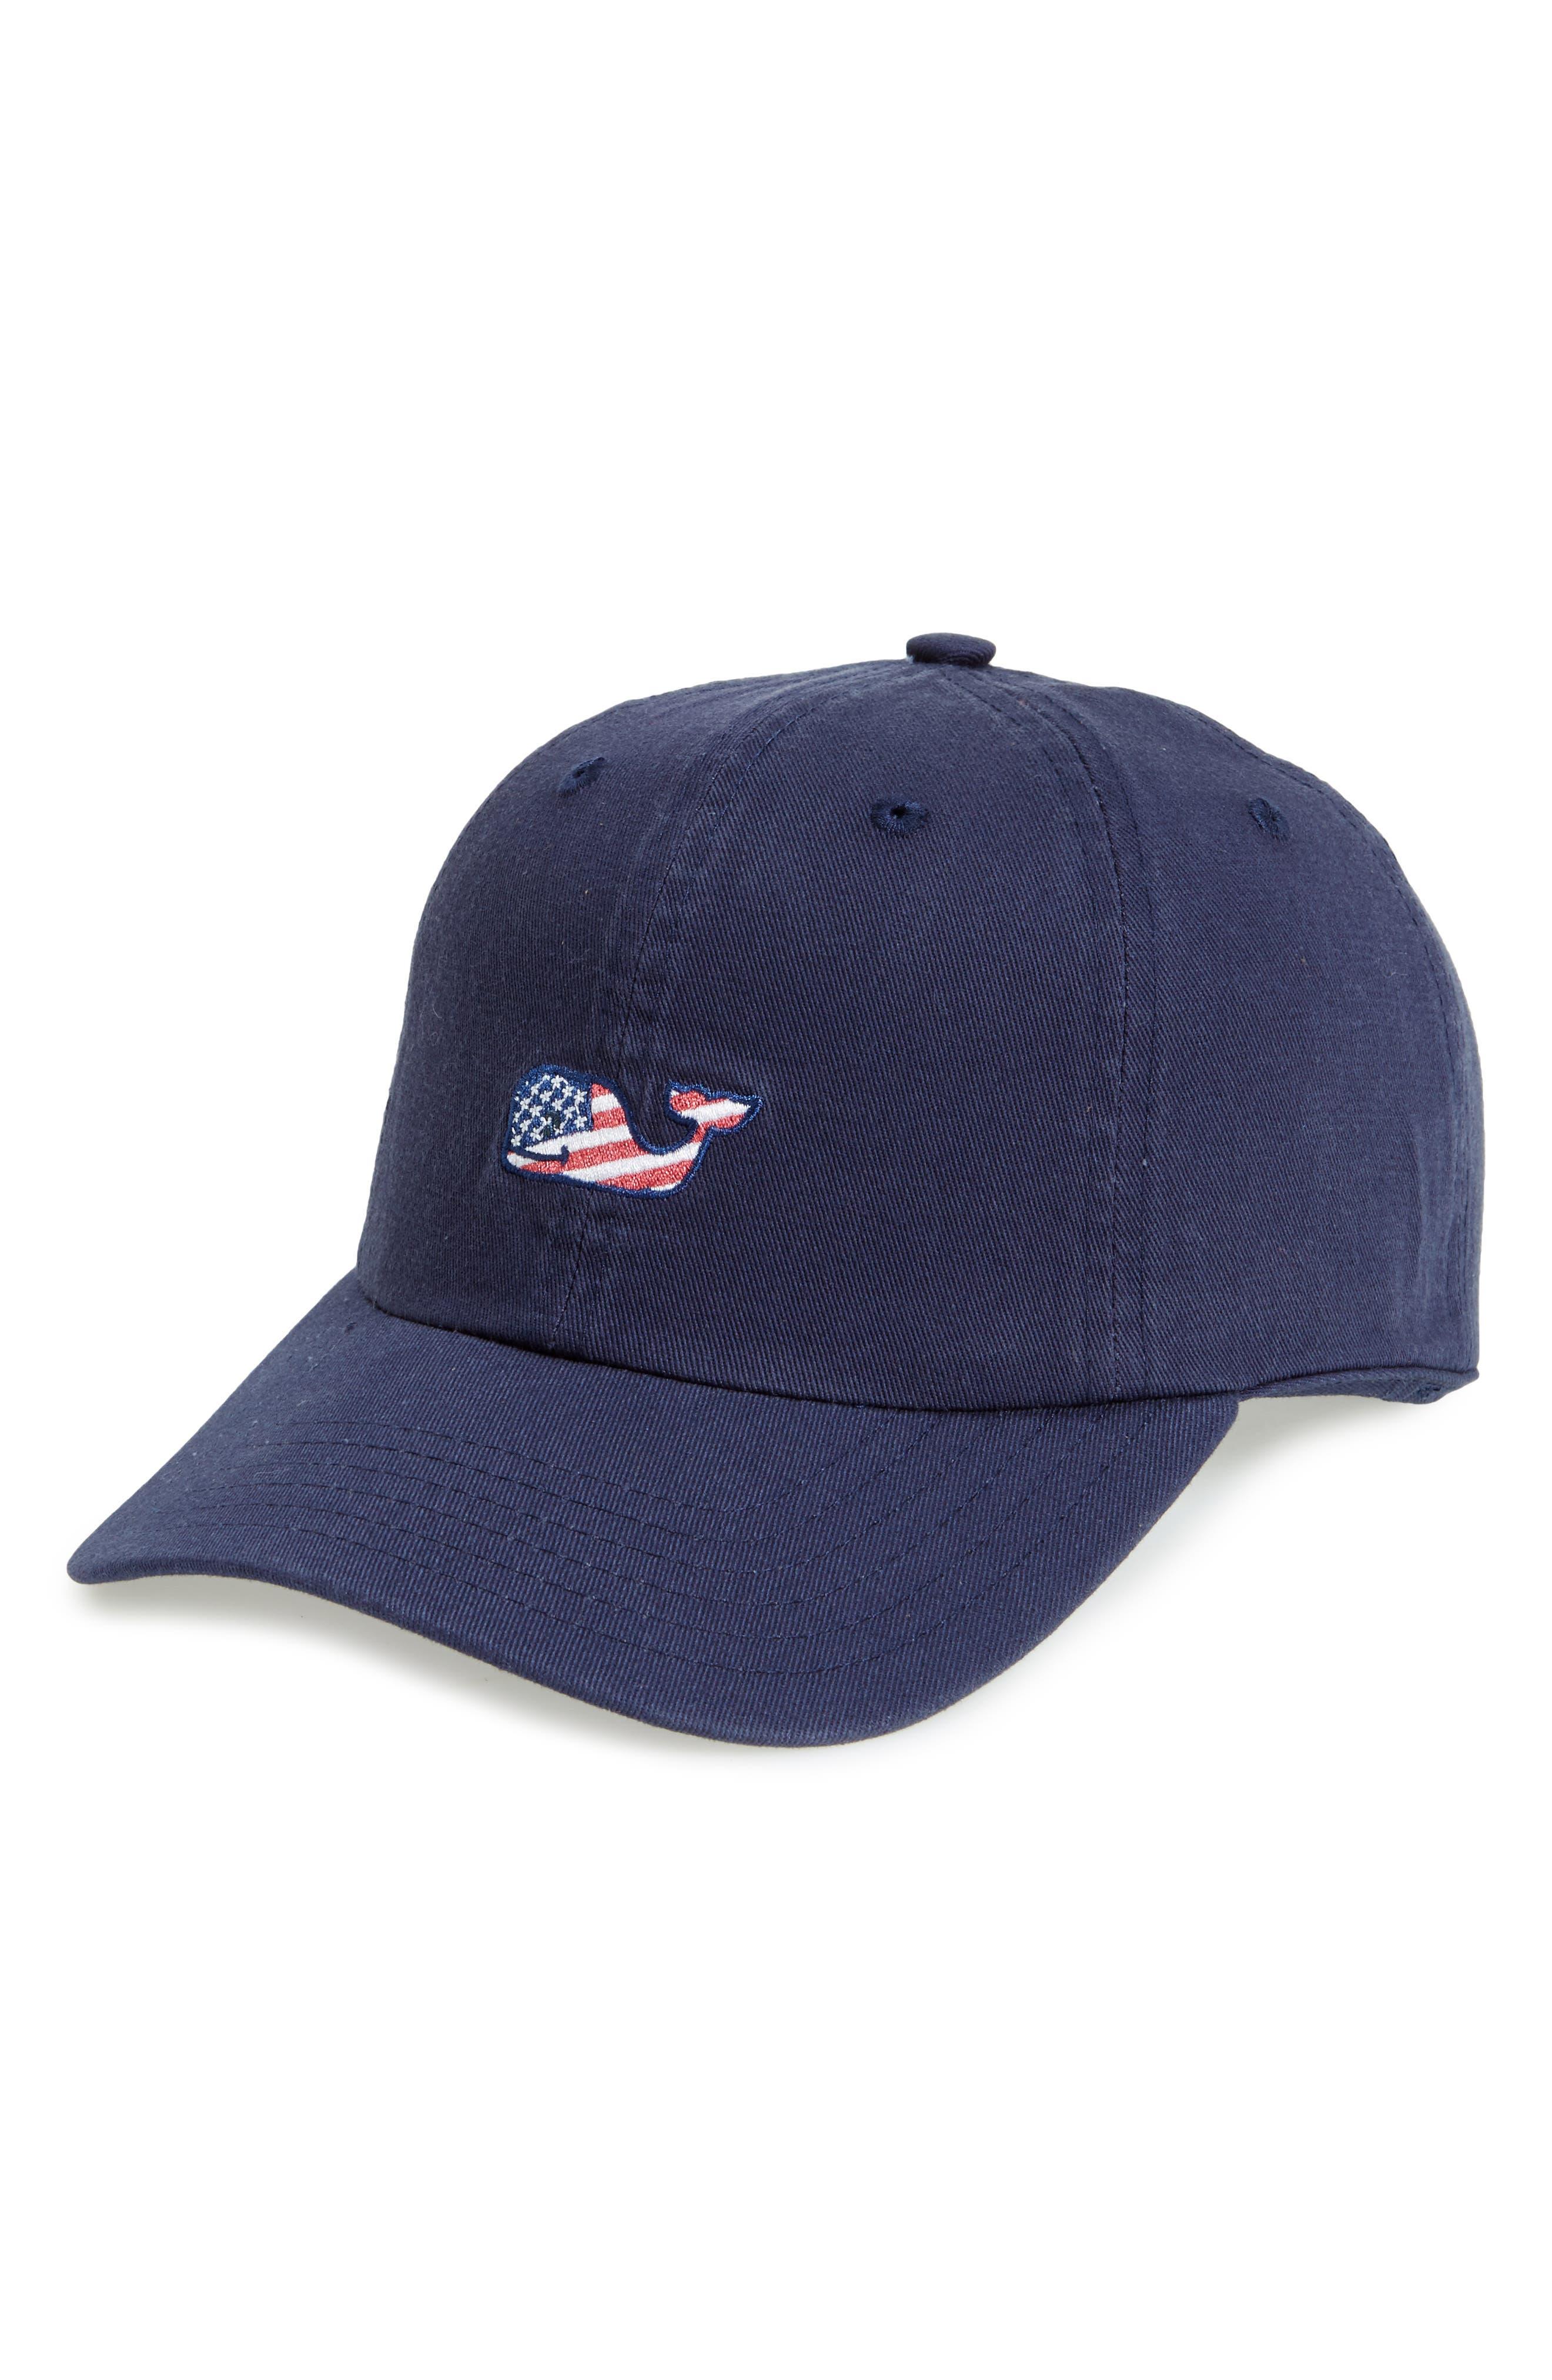 Main Image - vineyard vines Flag Whale Logo Baseball Cap